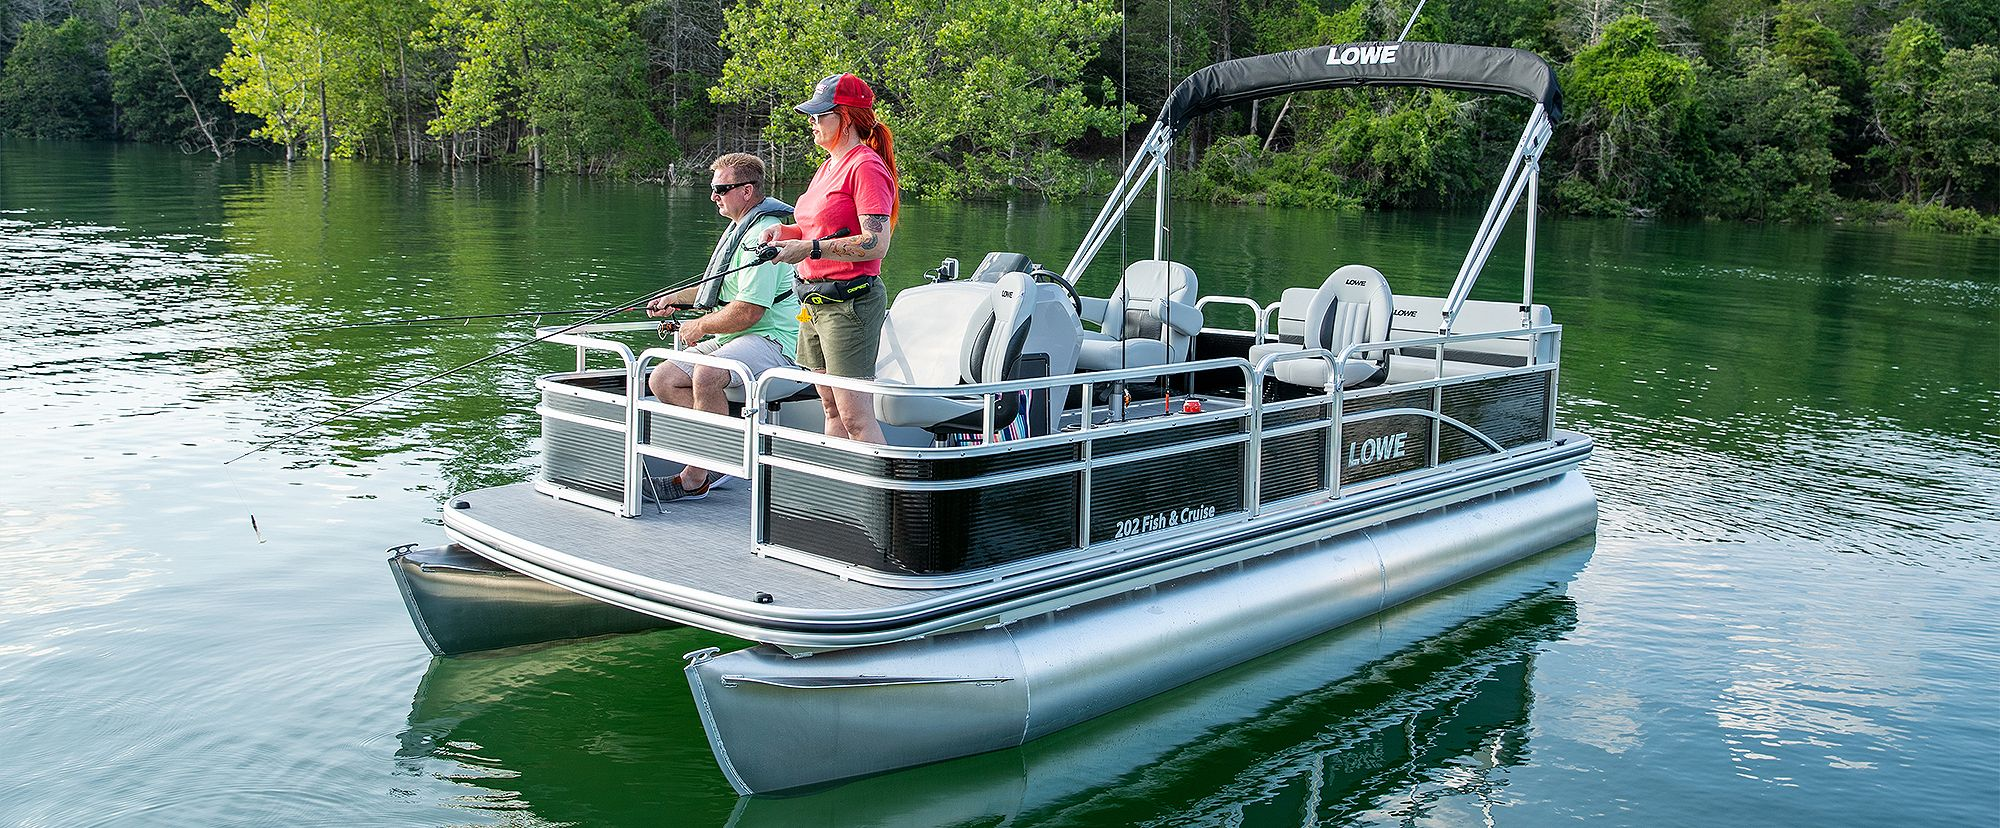 Lowe Category Page Ultra Layout Fish Cruise